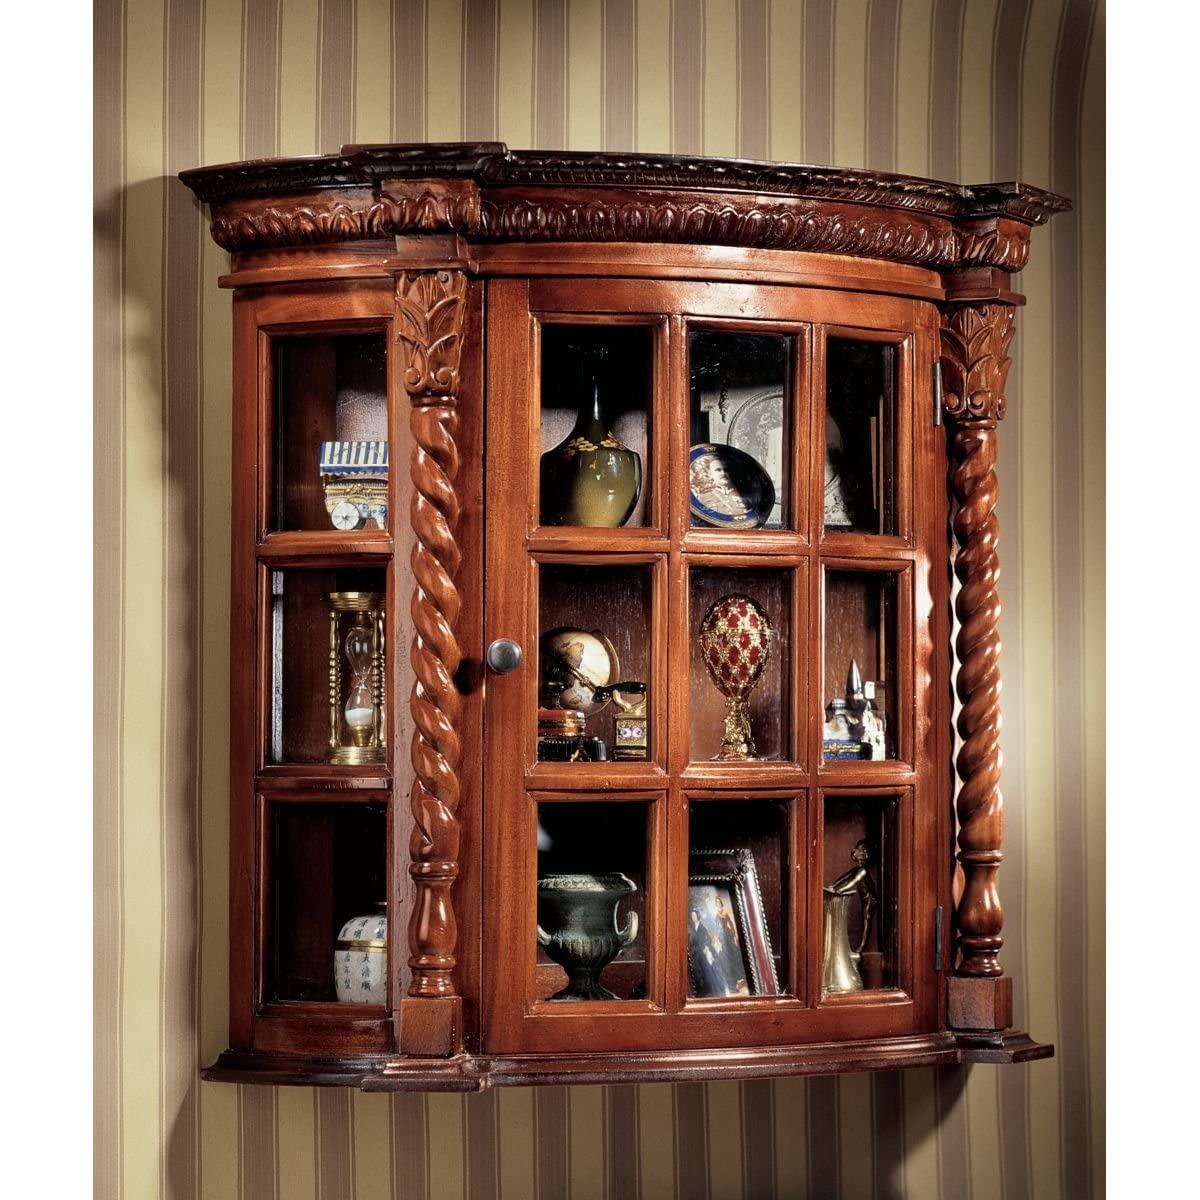 Antique Wall Curio Cabinets